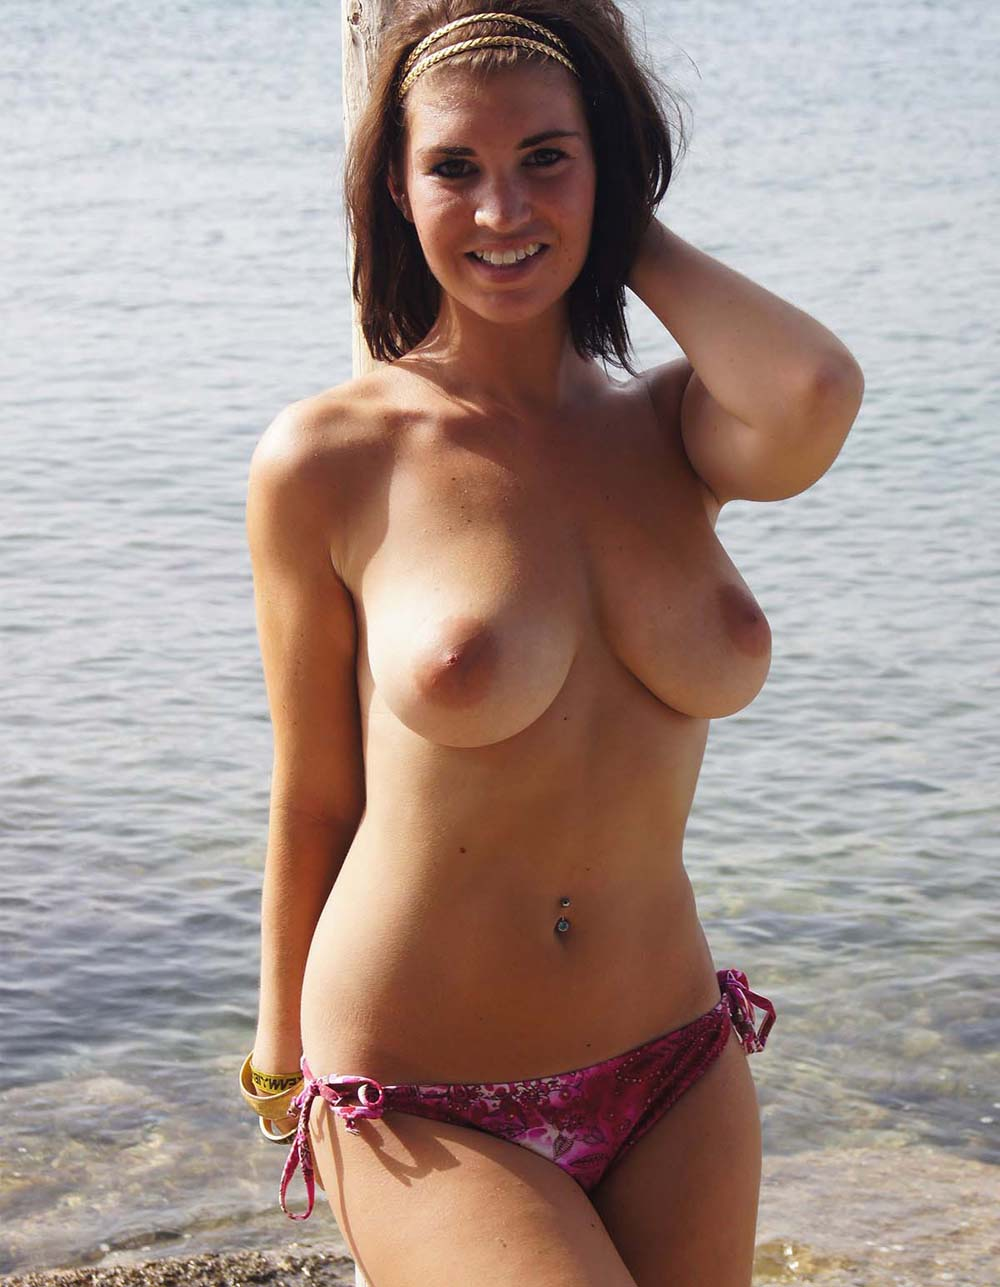 top site libertin des filles sexy nue